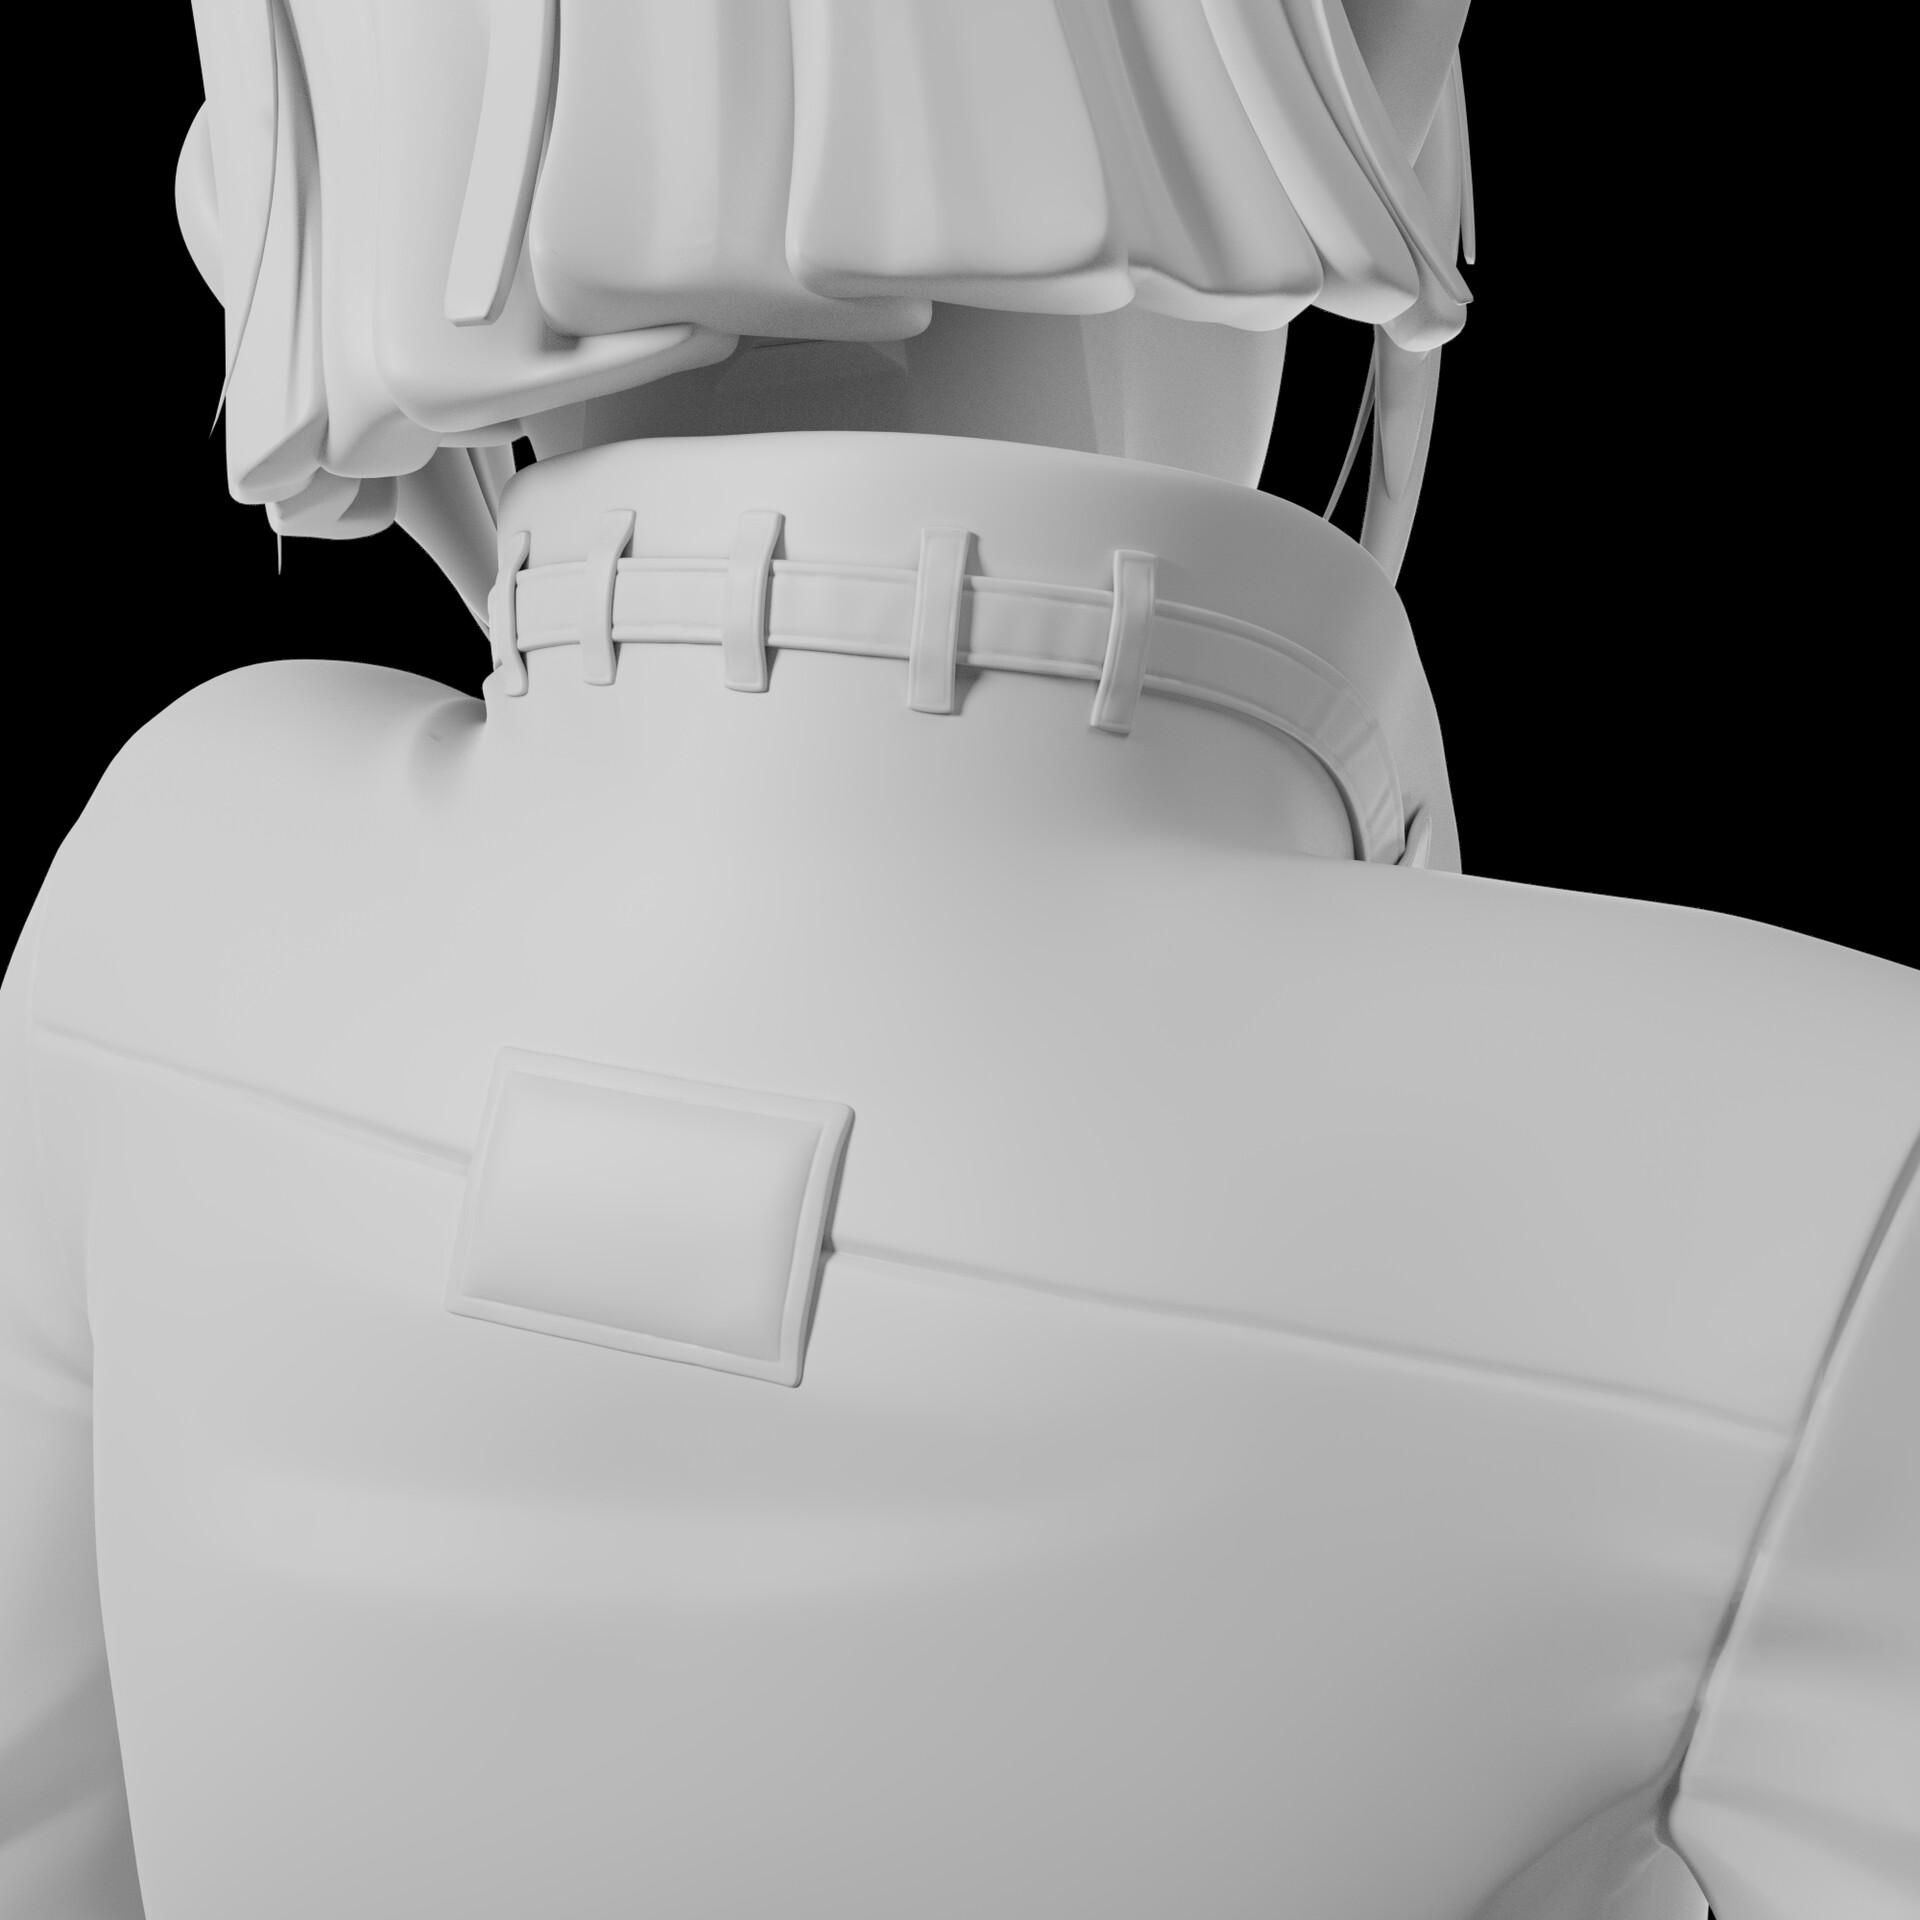 Sergi camprubi detail clay render 07